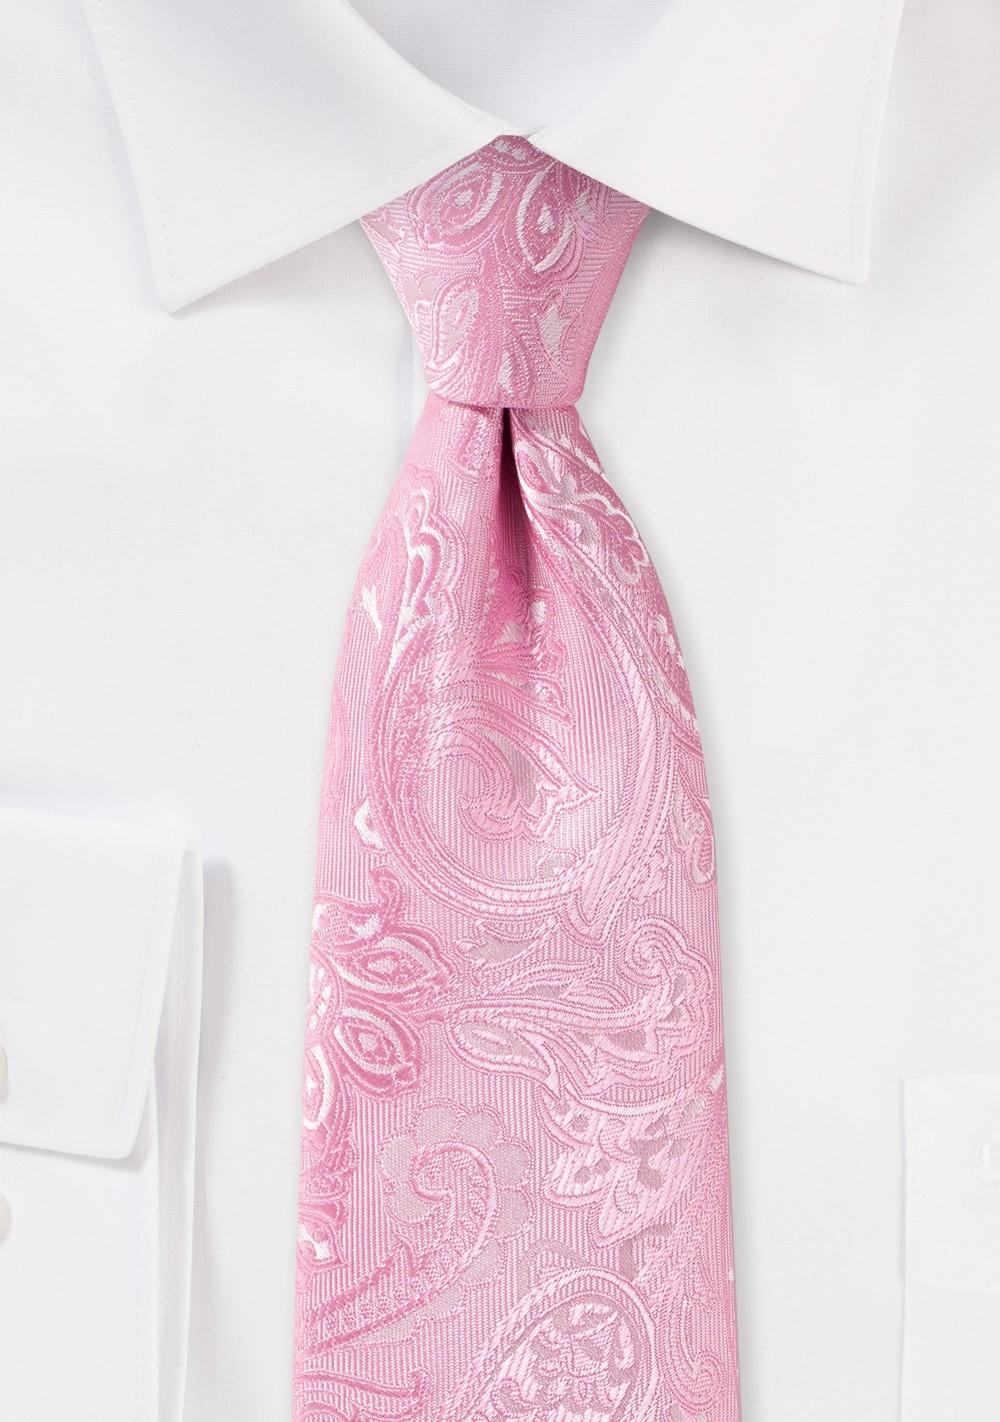 XXL Paisley Tie in Carnation